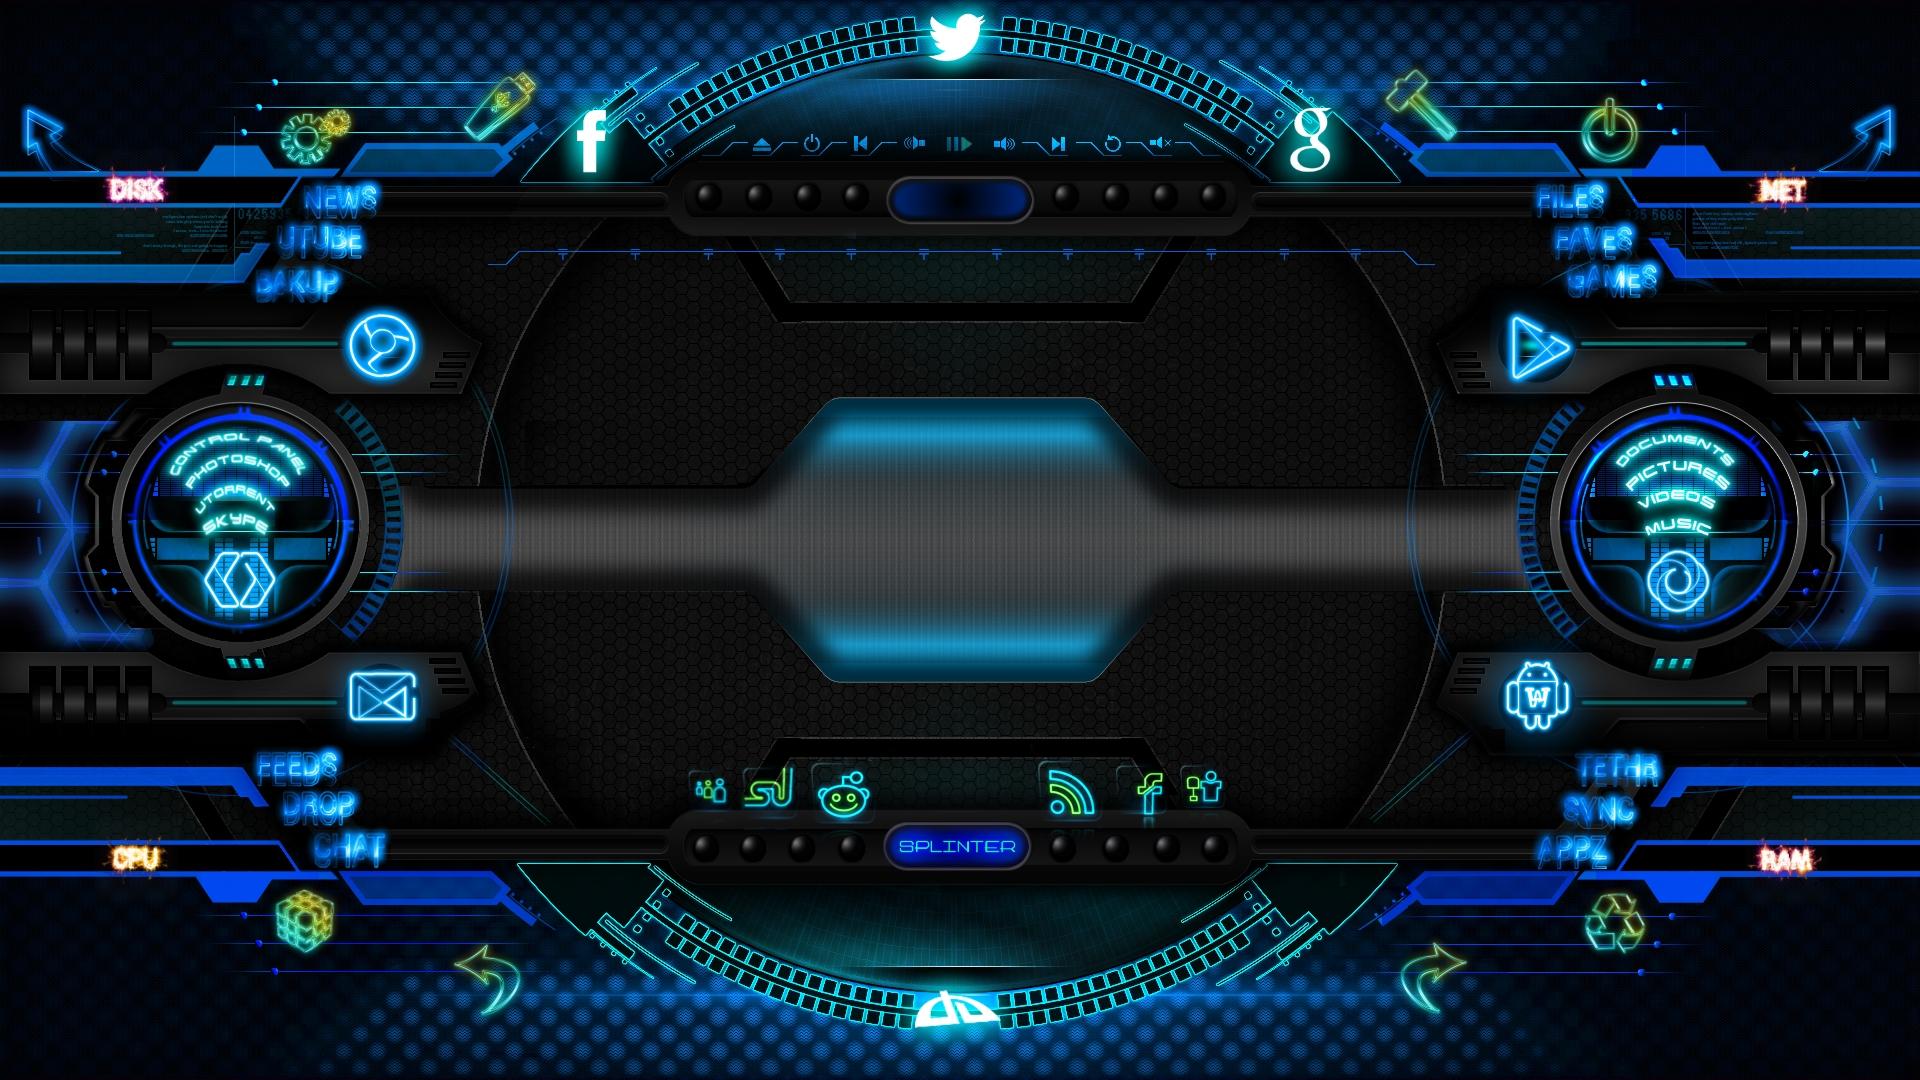 Evolution Edition Splinter Screenshot By Deema78 On DeviantArt